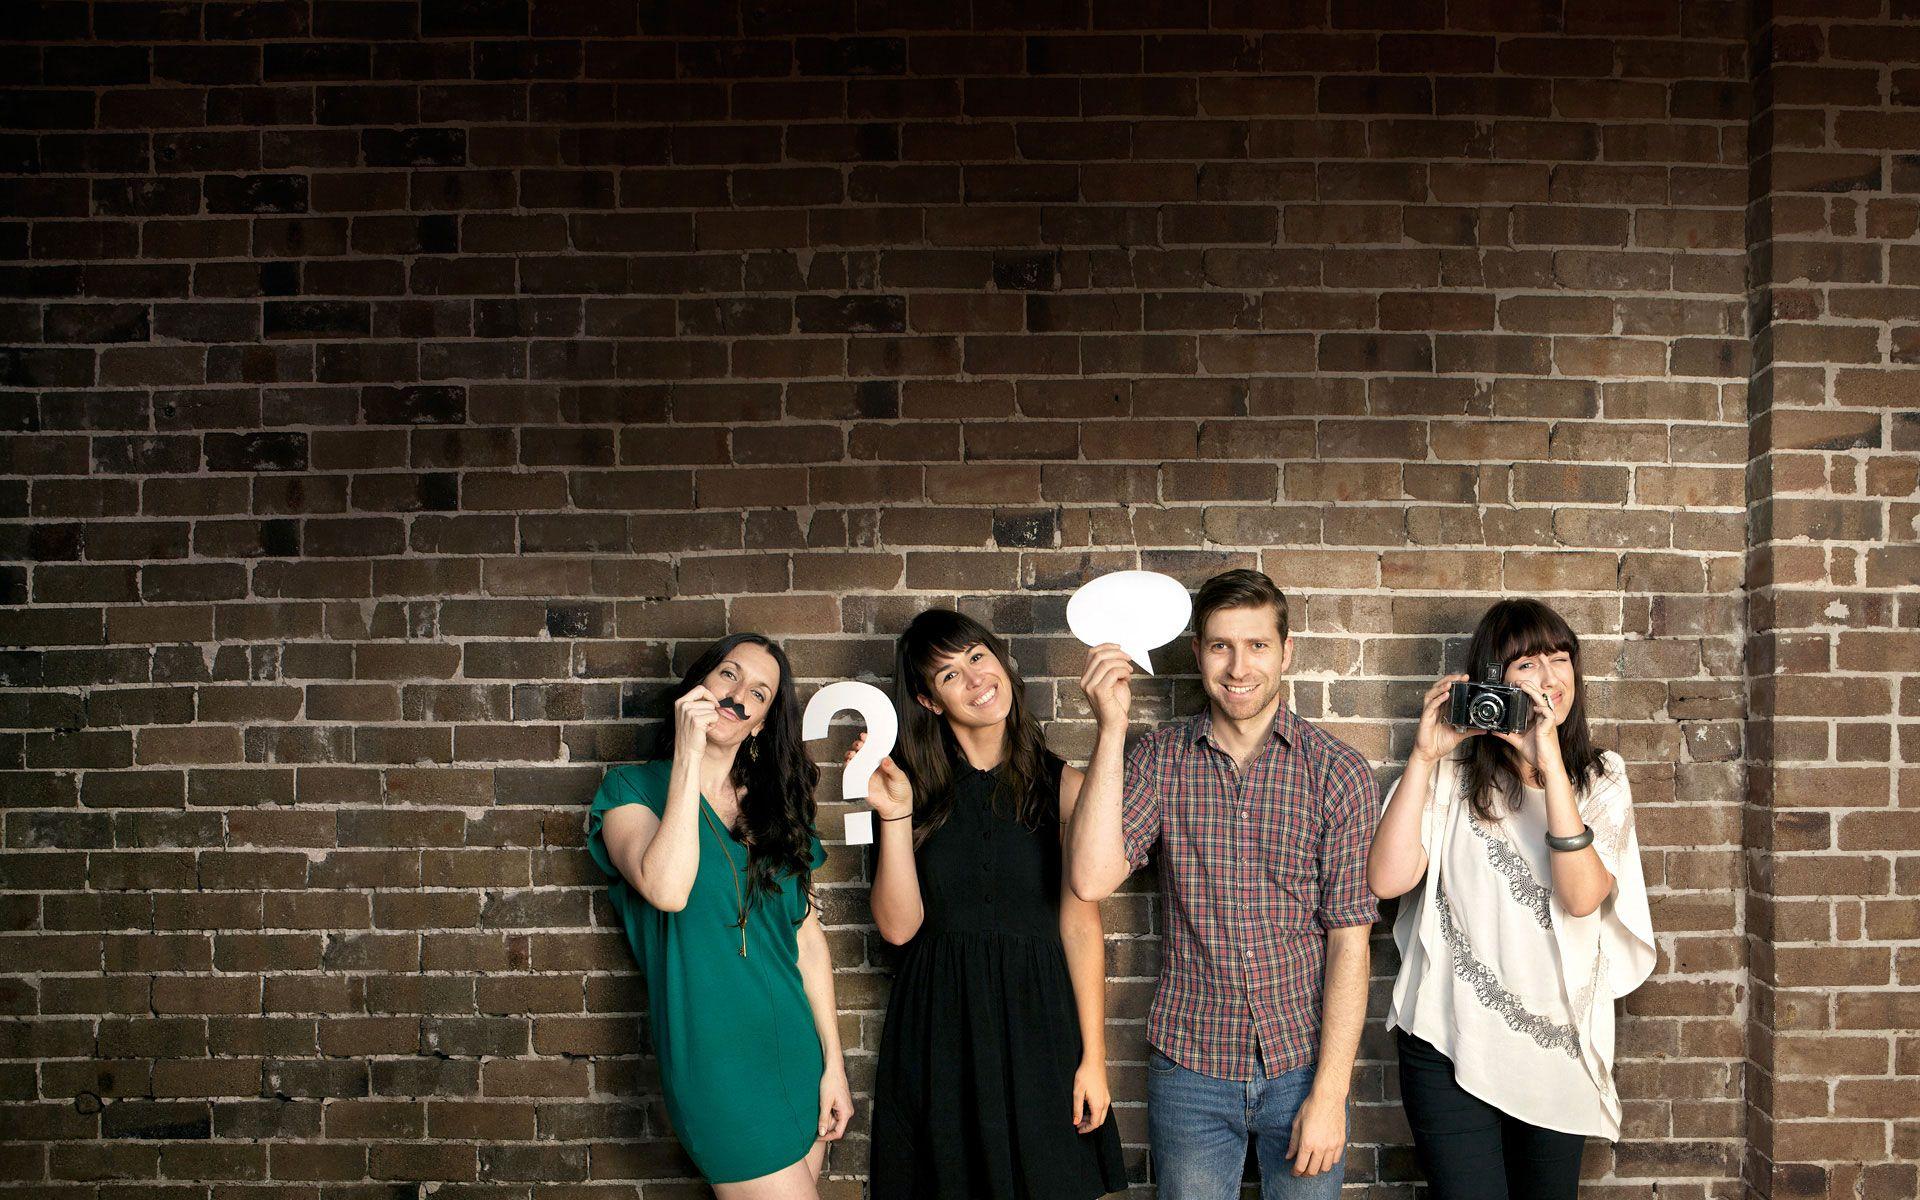 meet the team creative photoshoot